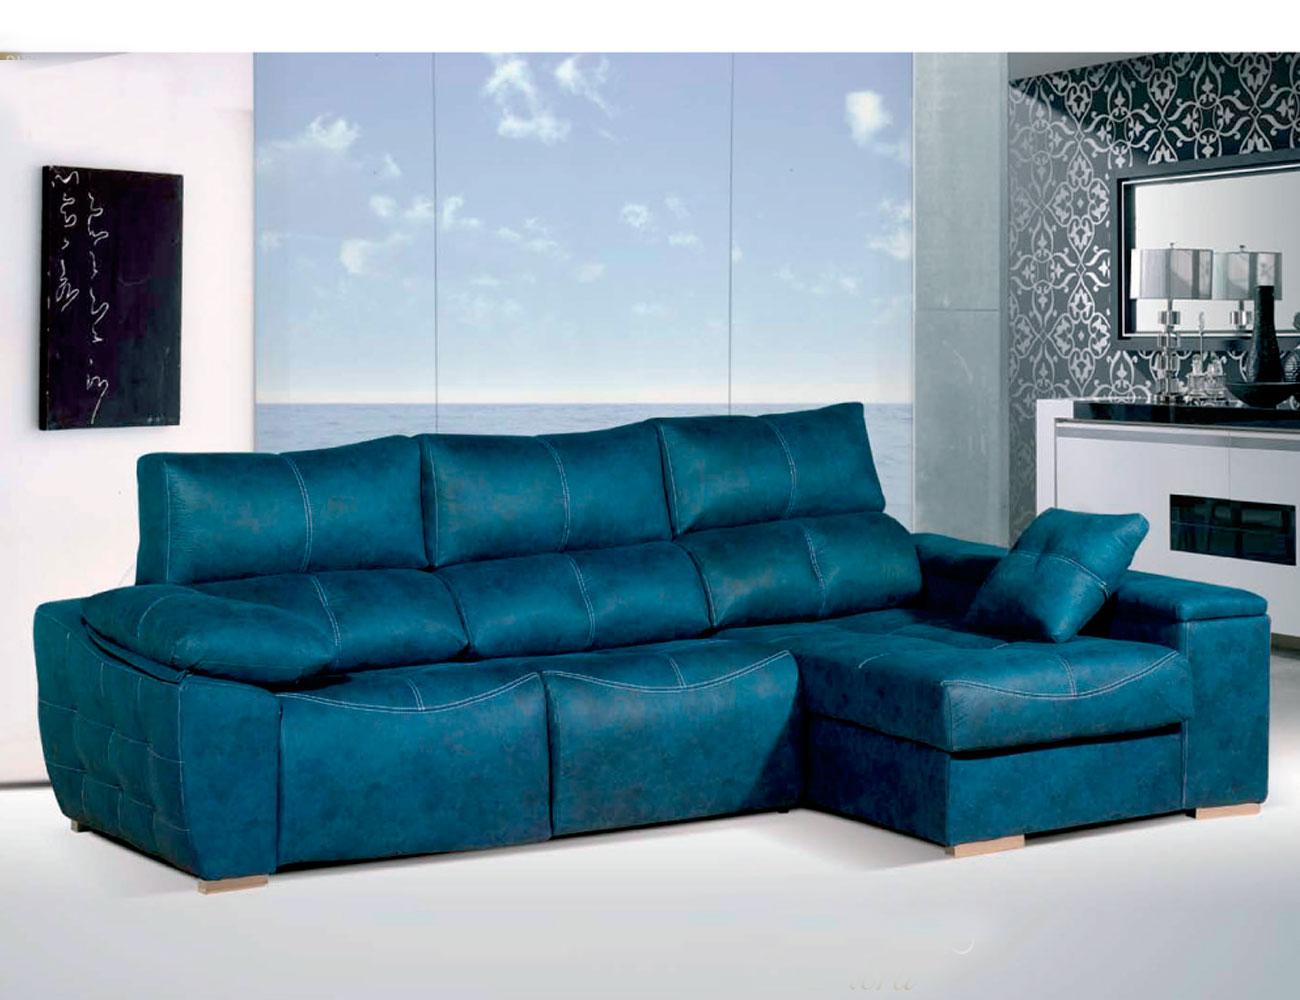 Sofa chaiselongue relax 2 motores anti manchas turquesa7